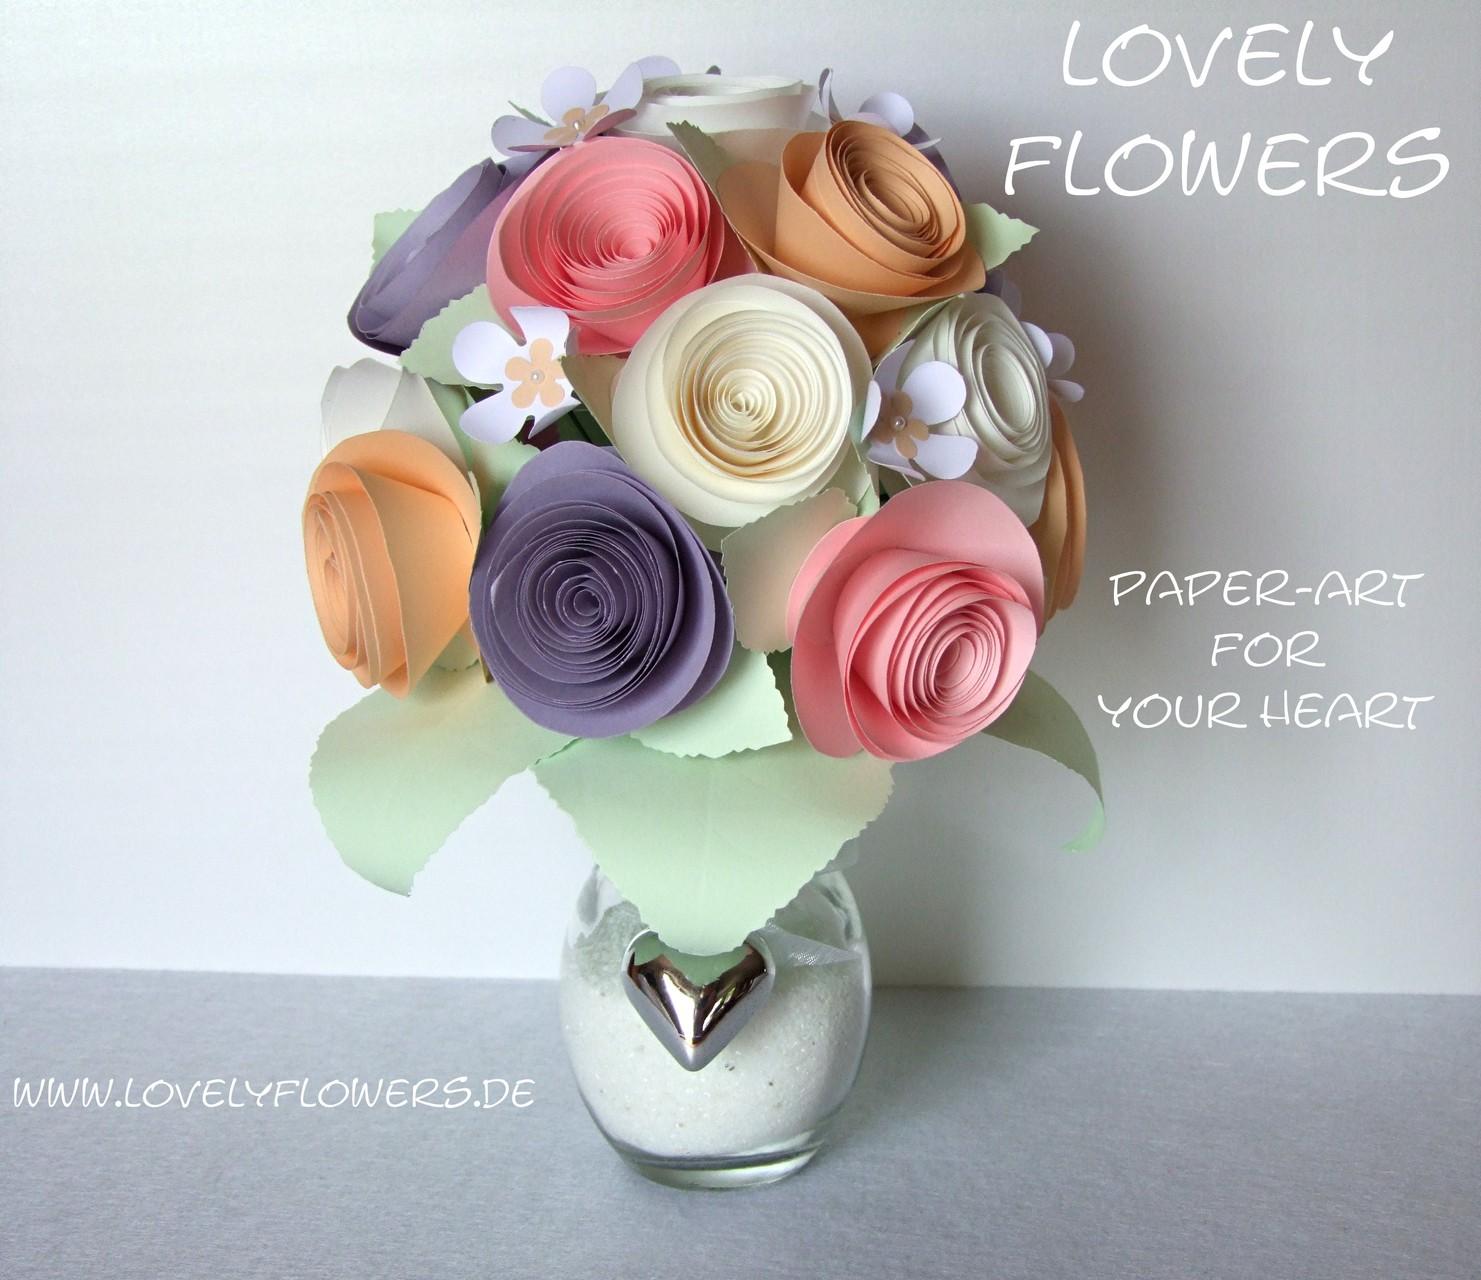 www.lovelyflowers.de - Dein Spezialist für PAPER-ART Blumenbouquets aller Art!